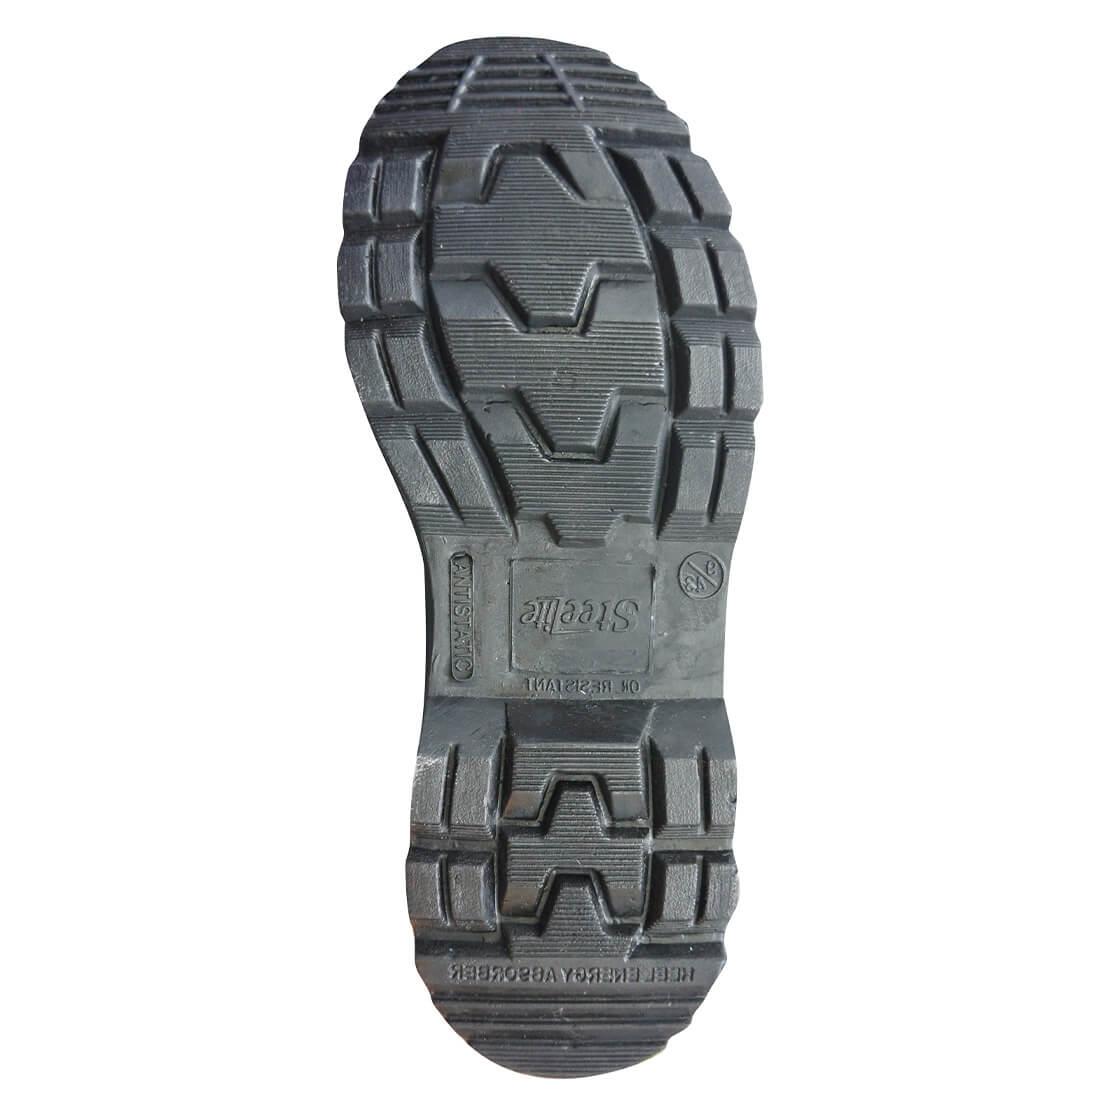 Pantof Steelite™ Thor S3 - Incaltaminte de protectie